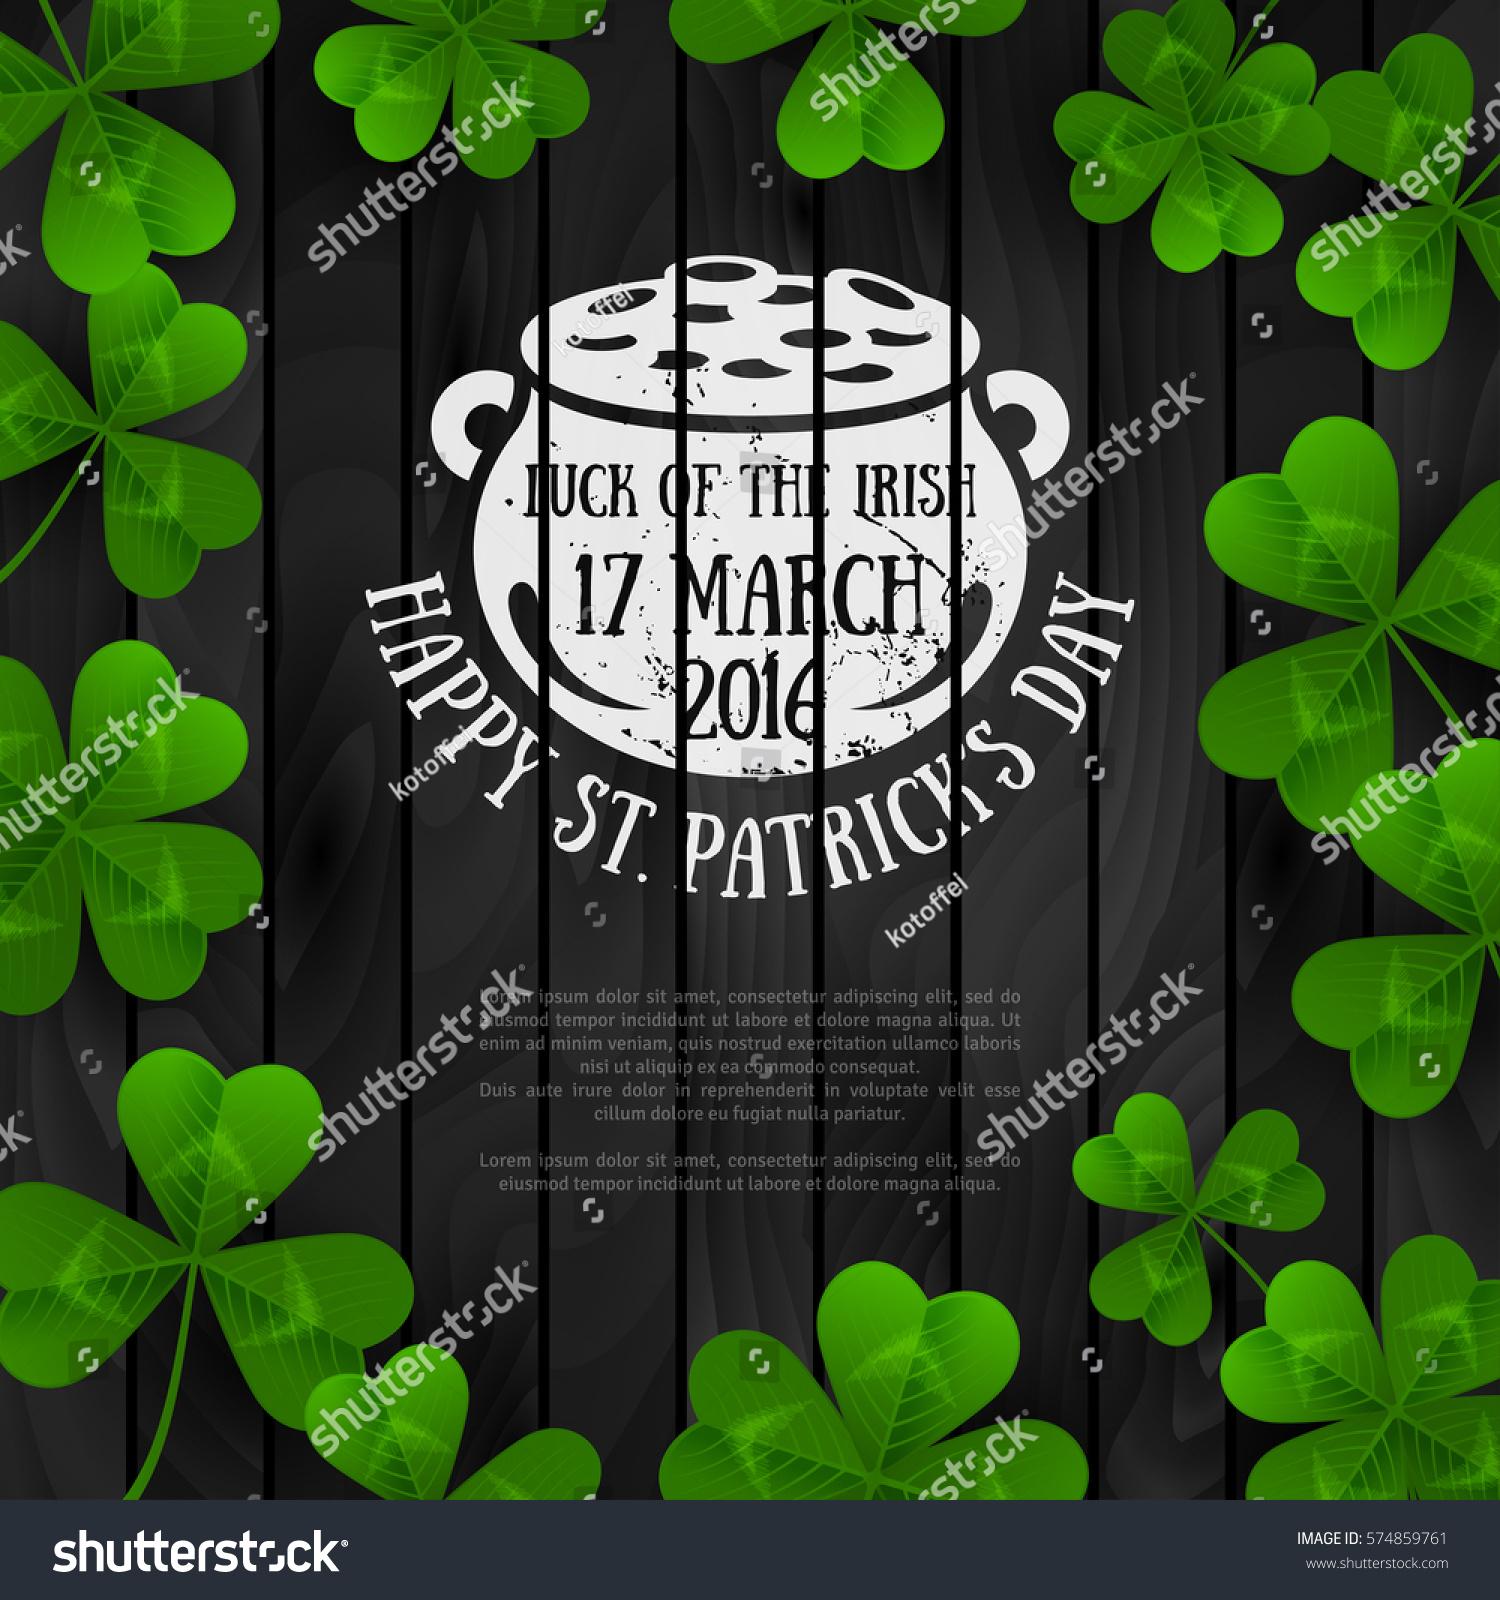 irish menu templates - saint patricks day banner green four stock vector